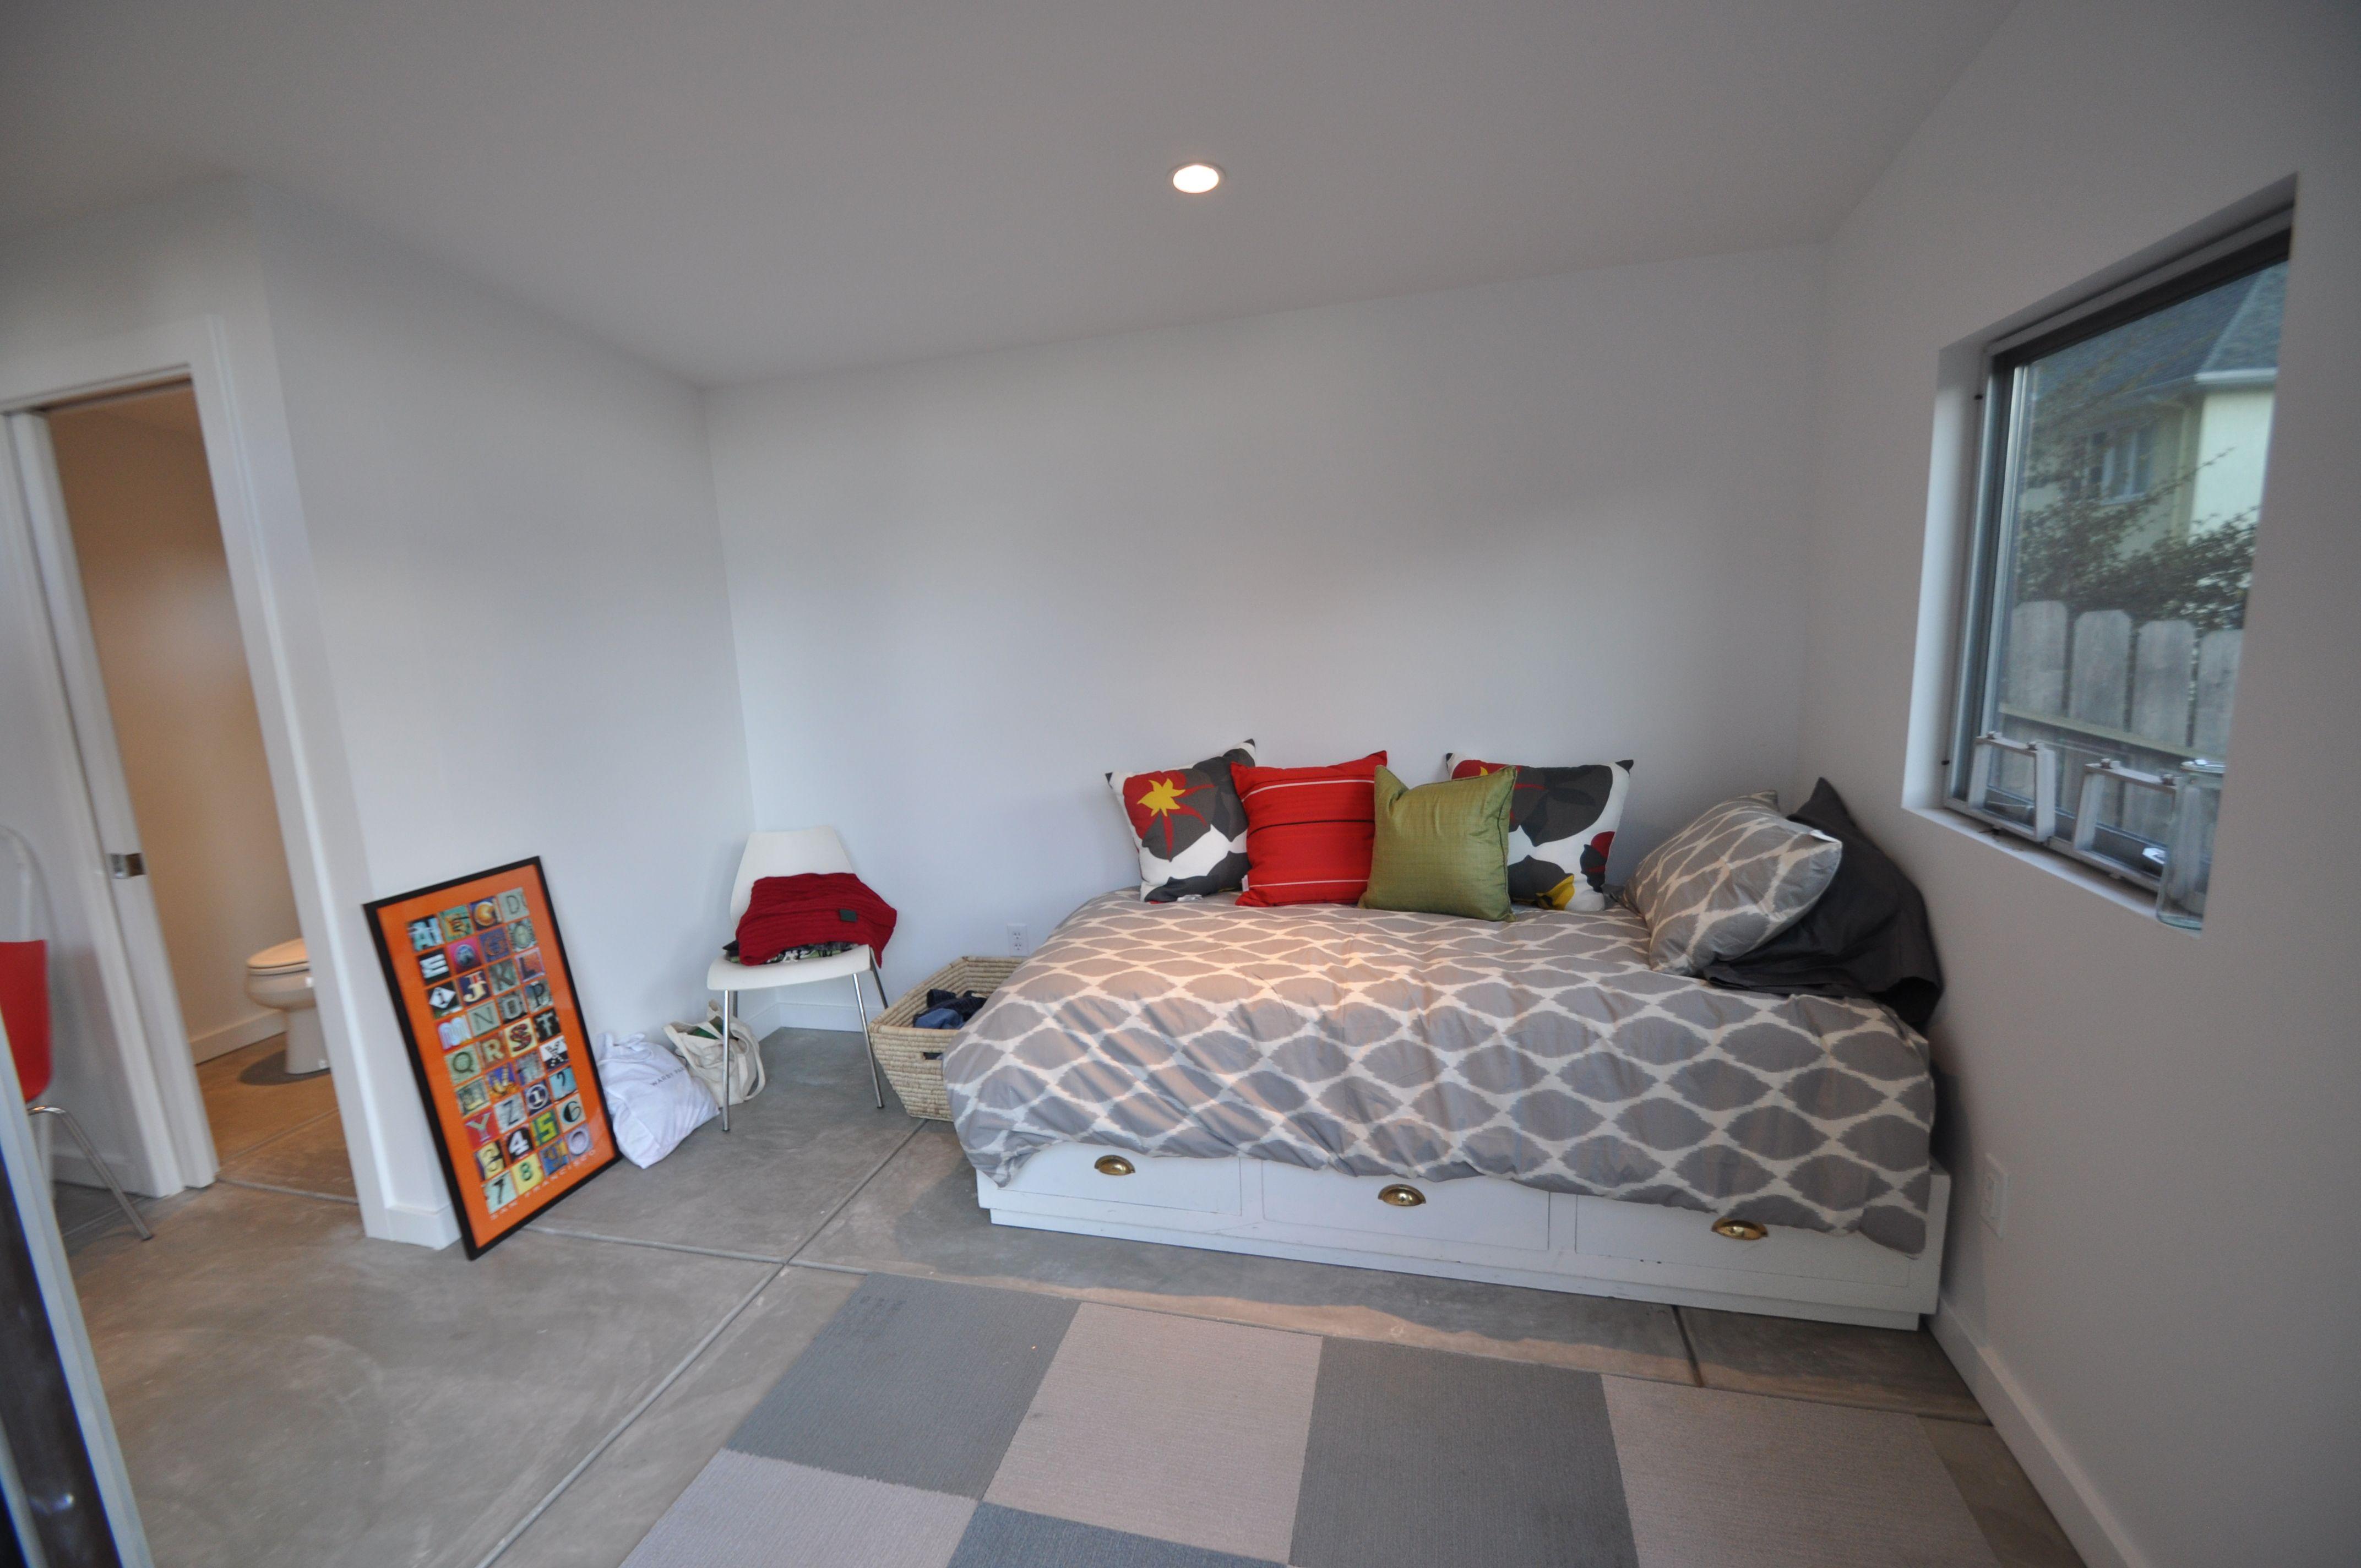 Wwwstudioshedcom Designer Series This Studio Shed Guest Room - Studio shed with bathroom for bathroom decor ideas